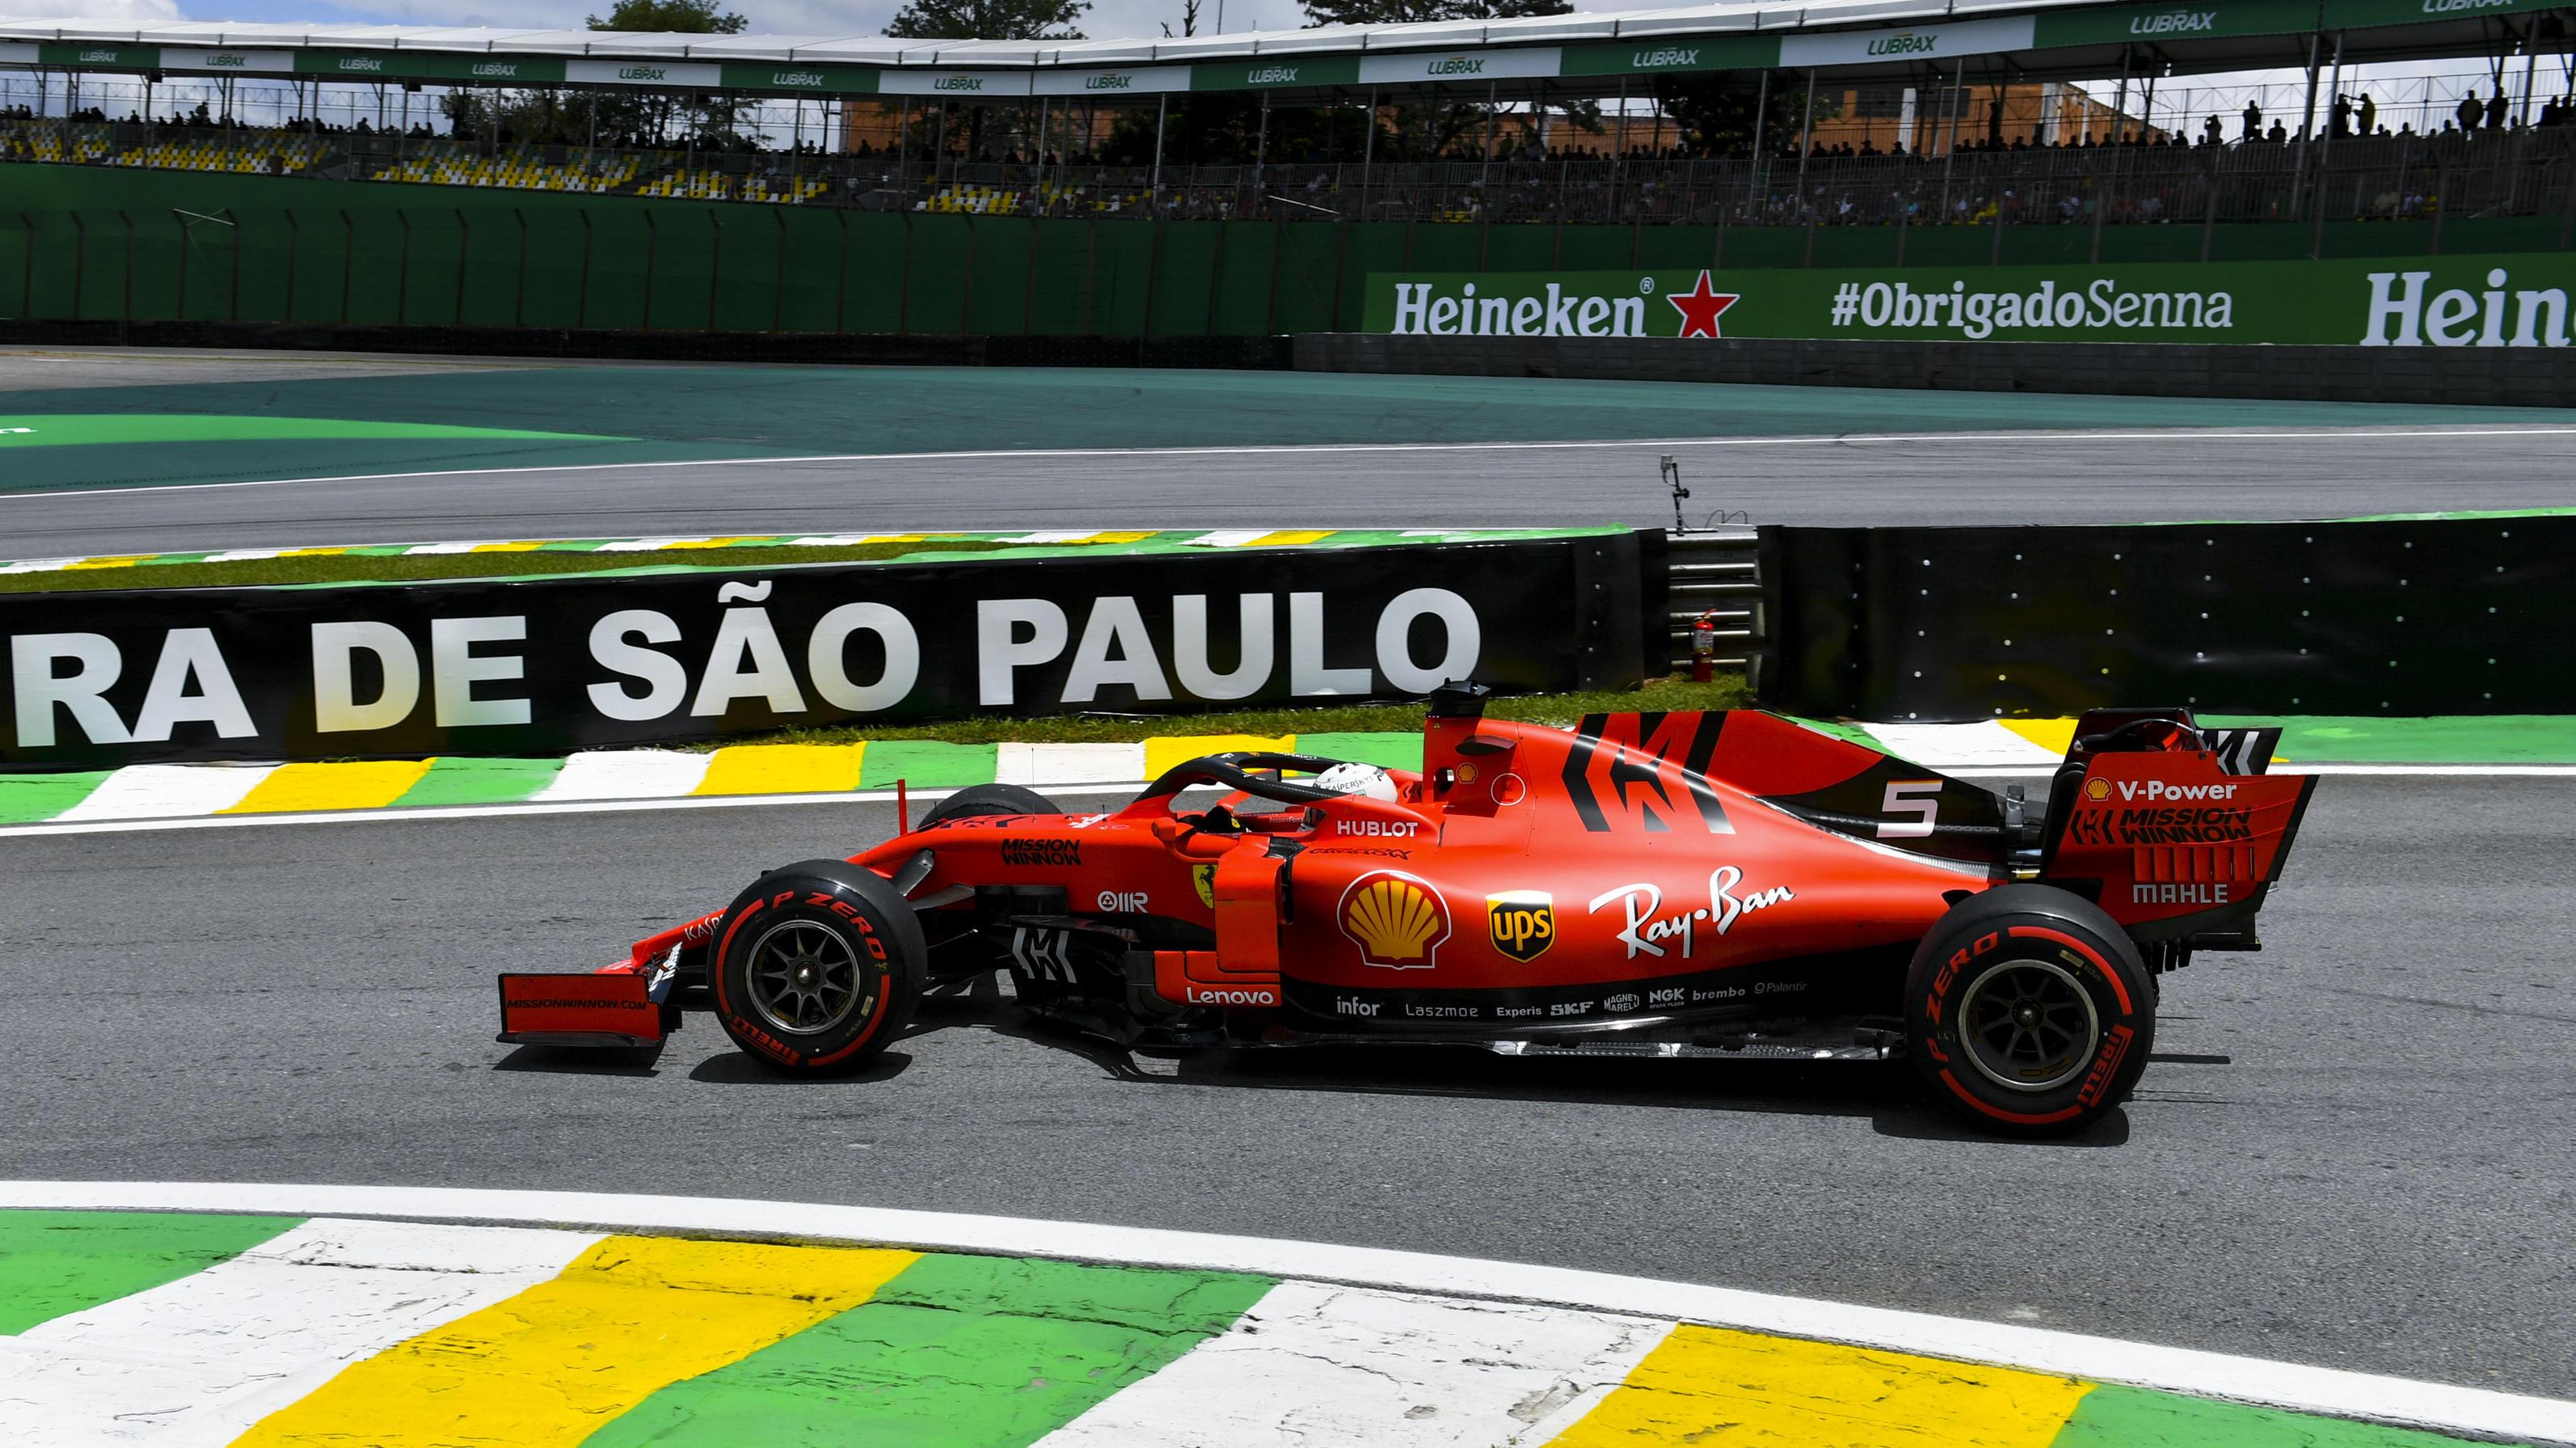 Trotz Ferrari-Topspeed: Lewis Hamilton distanziert kurvenlahmen Sebastian Vettel im 3. Training zum Brasilien-GP - RTL Online